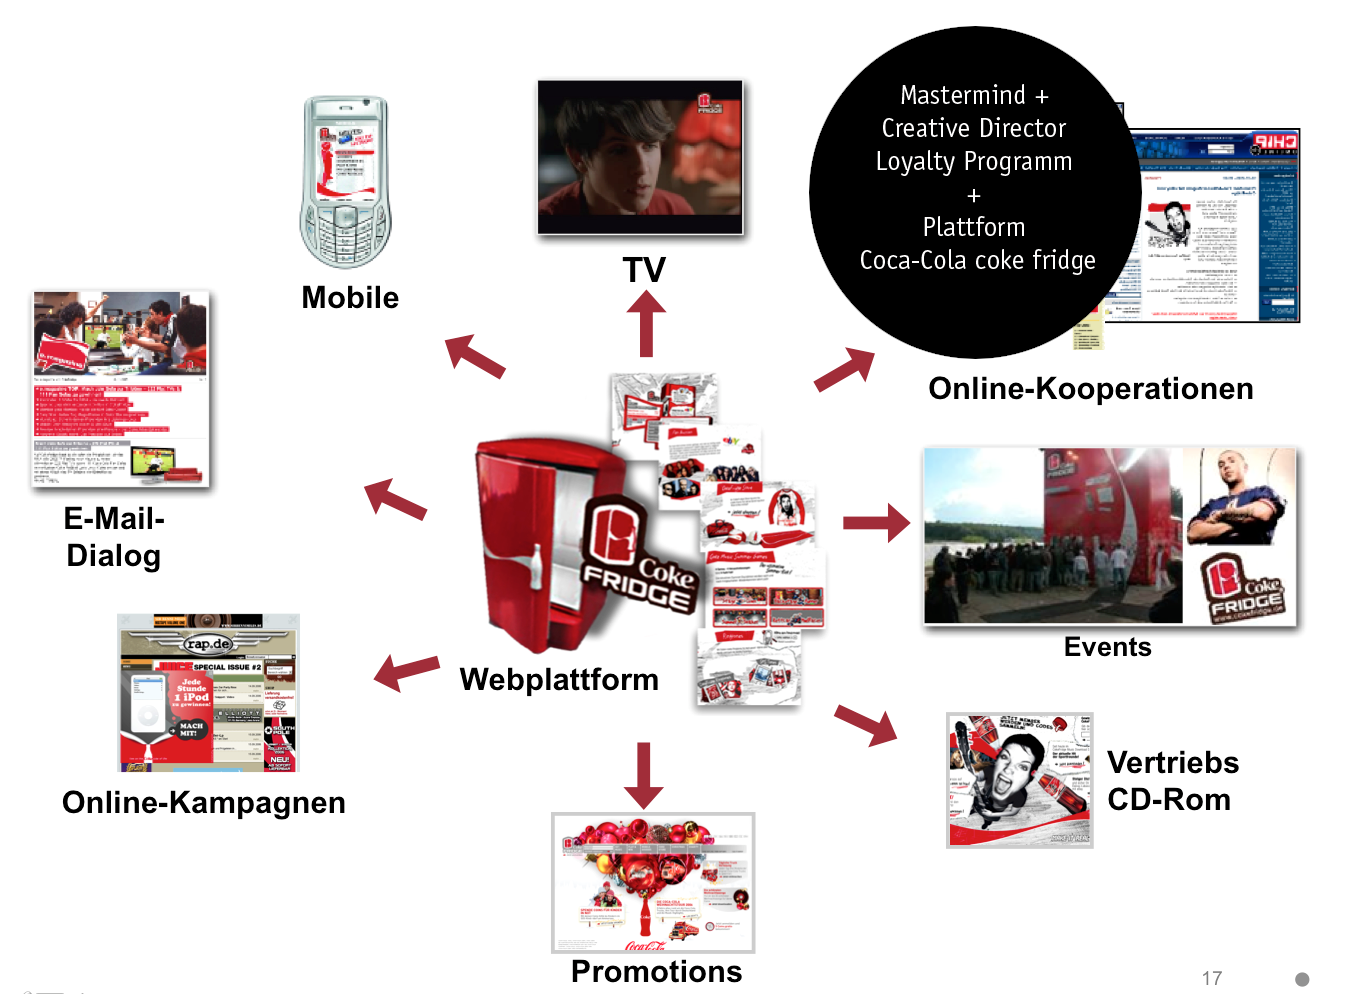 Creative Director + strategy mastermind of the Coca-Cola Loyalty Platform Coke Fridge.